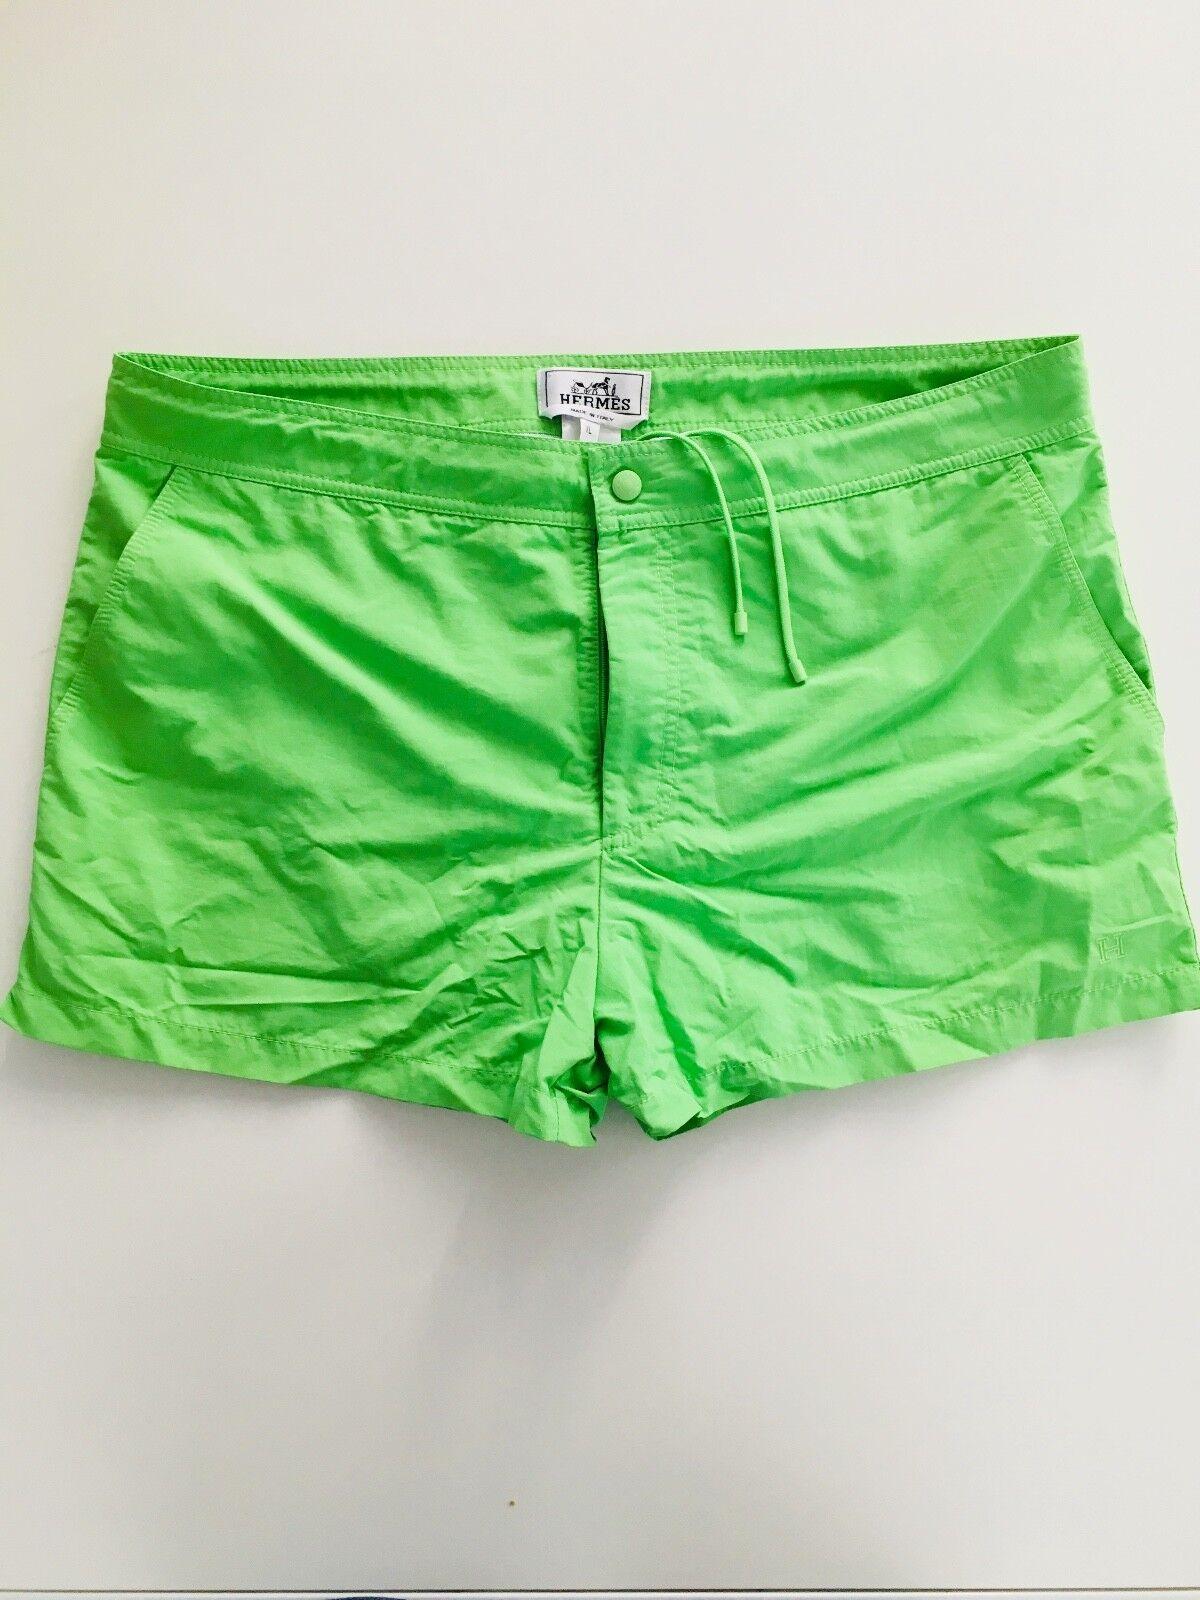 HERMES PARIS Mens Swim Shorts TOILE DE BAIN in Lime Green - Size XL(36w) - BNWOT